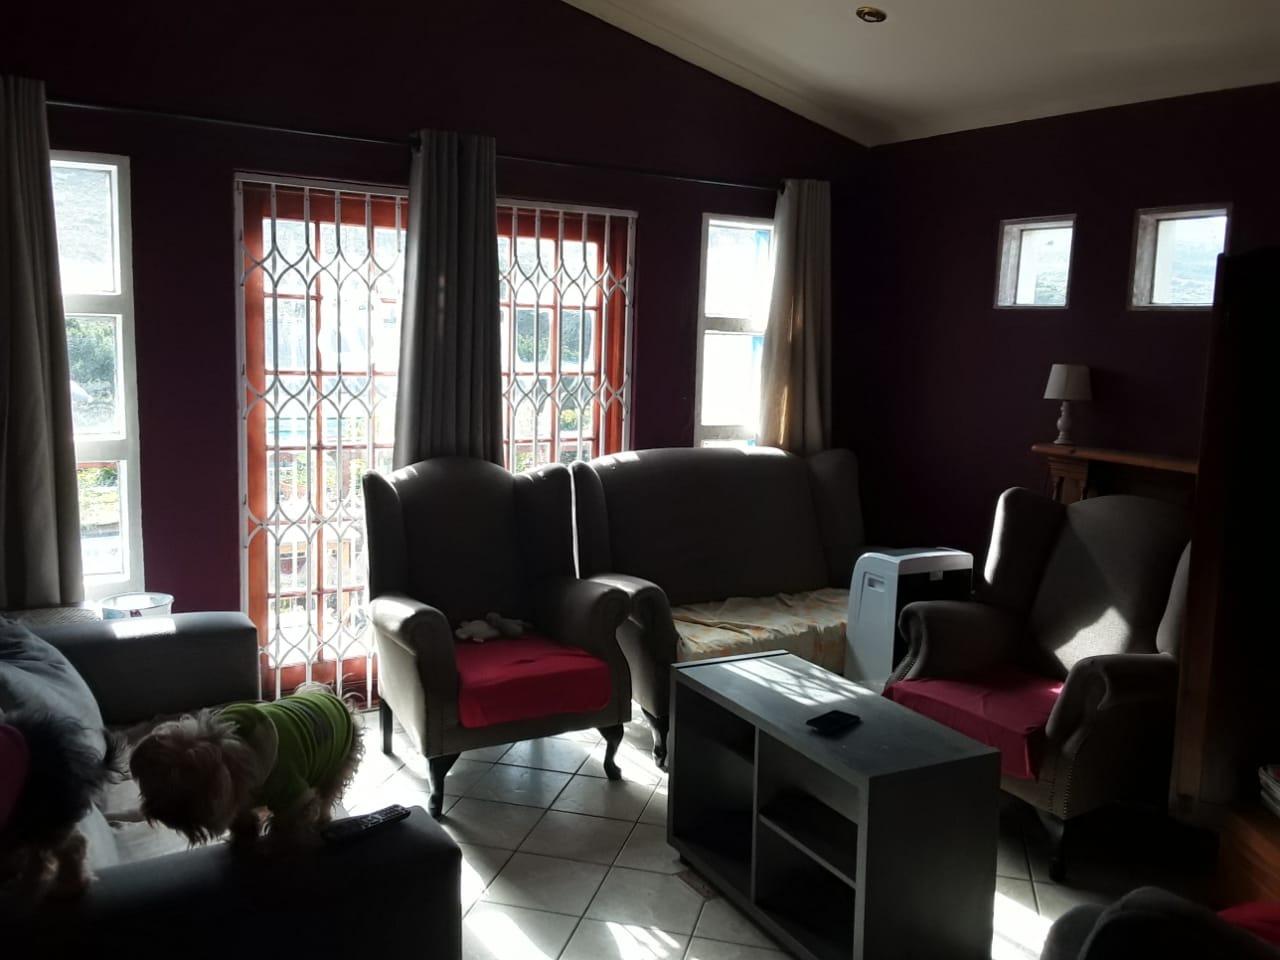 3 Bedroom House For Sale in Welcome Glen